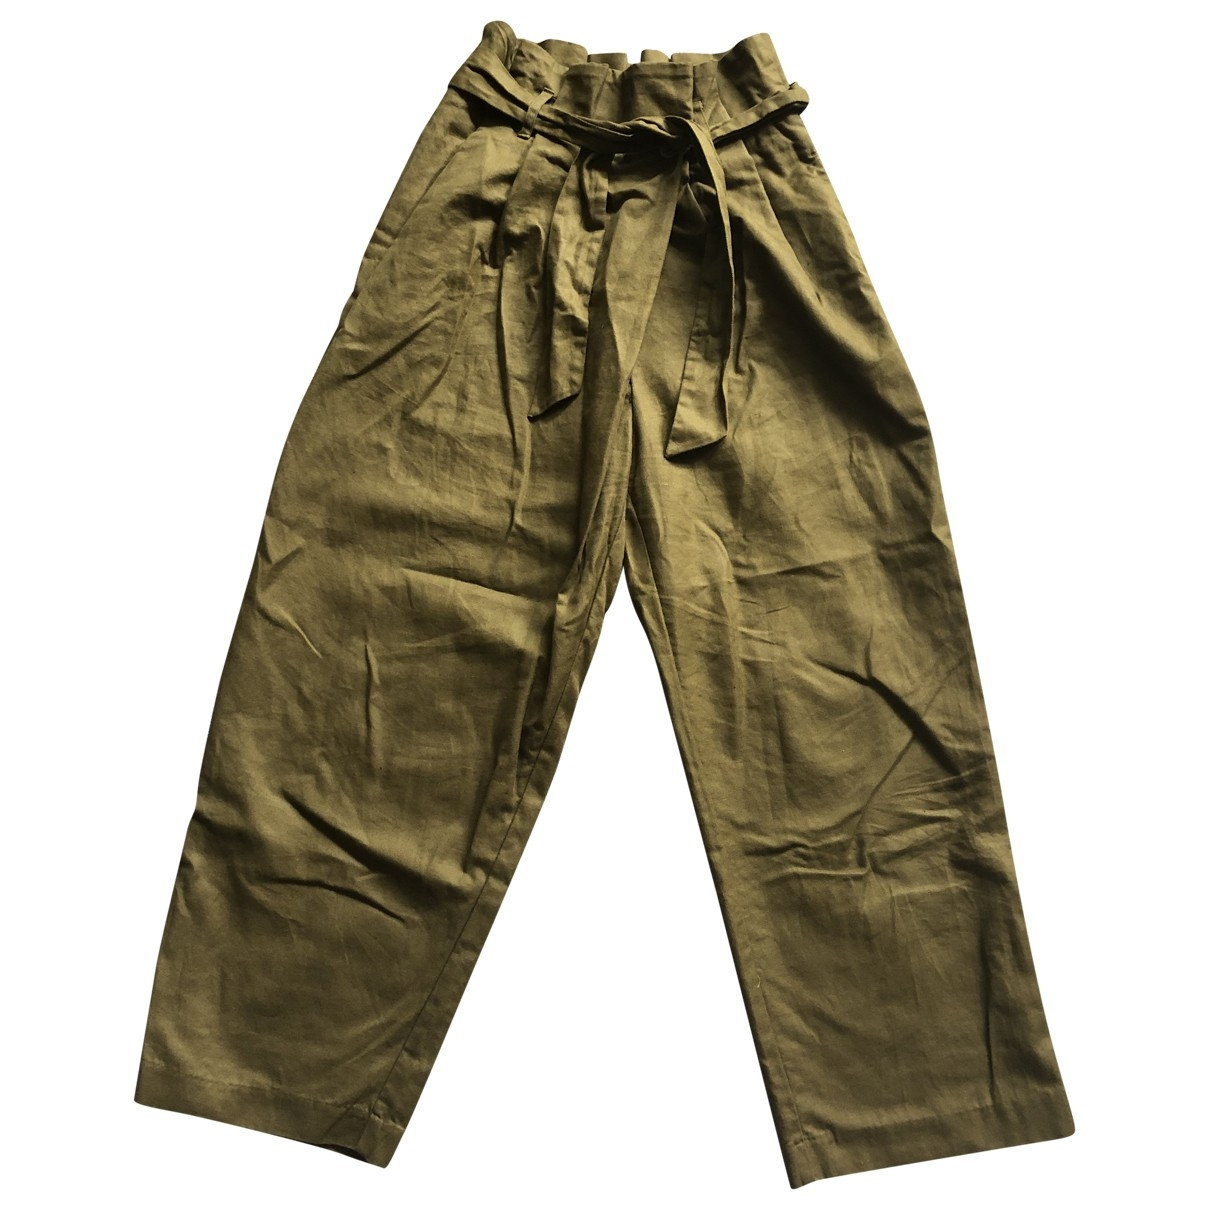 Zara \N Khaki Cotton Trousers for Women S International